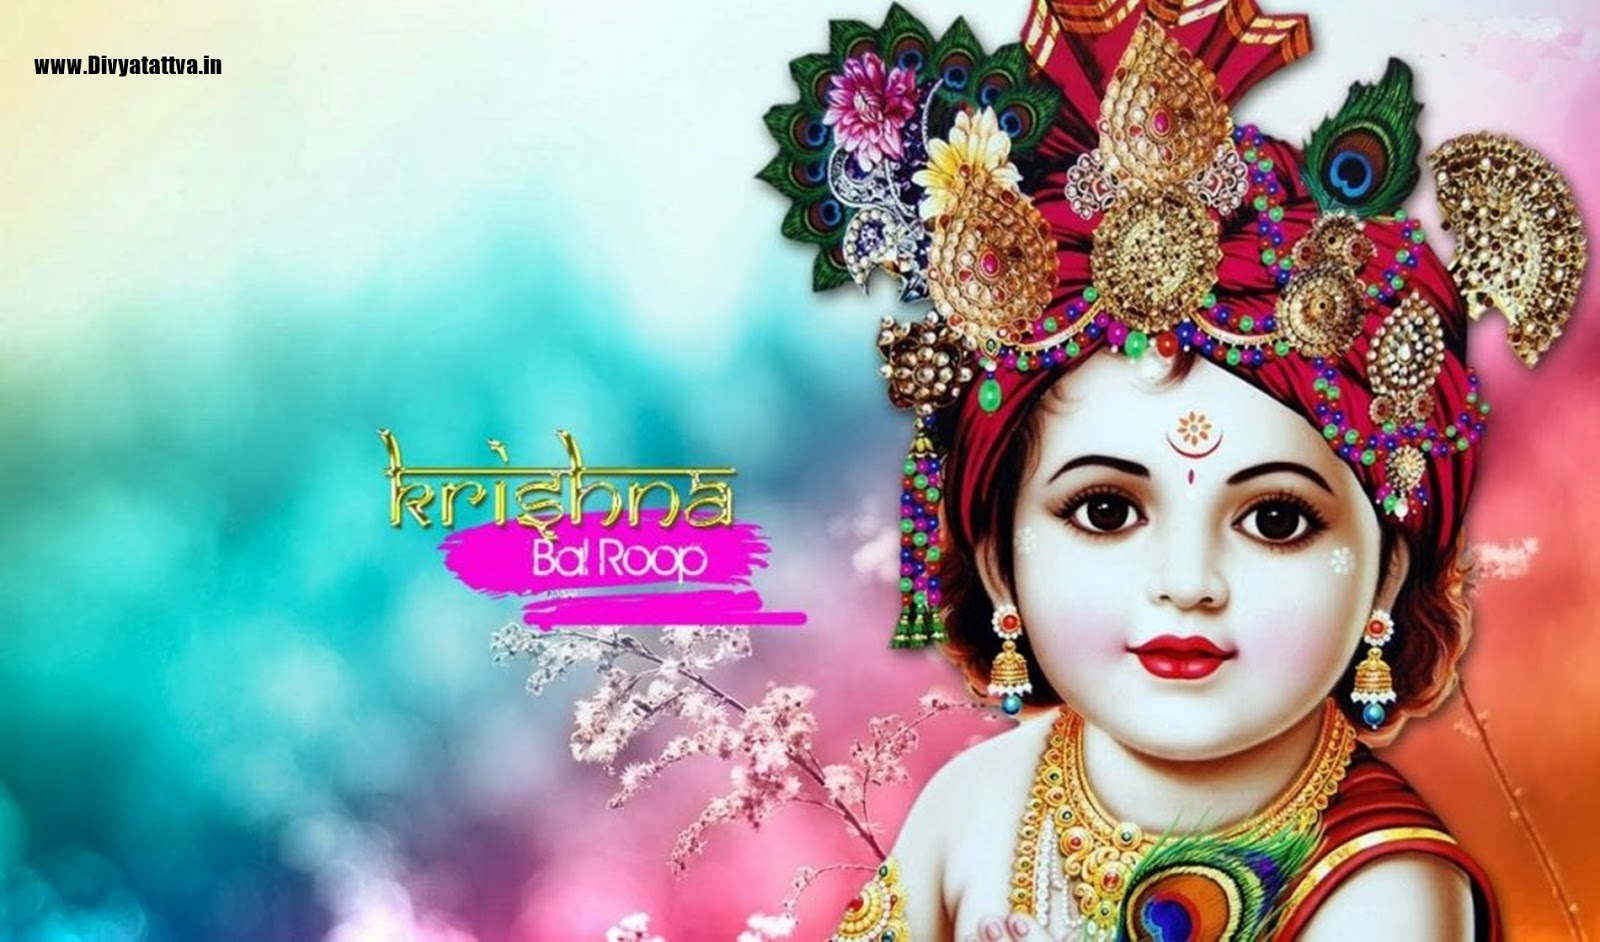 Cute Baby Krishn Wallpaper Bala Gopala Hd Background Images Hindu Gods Photos Indian